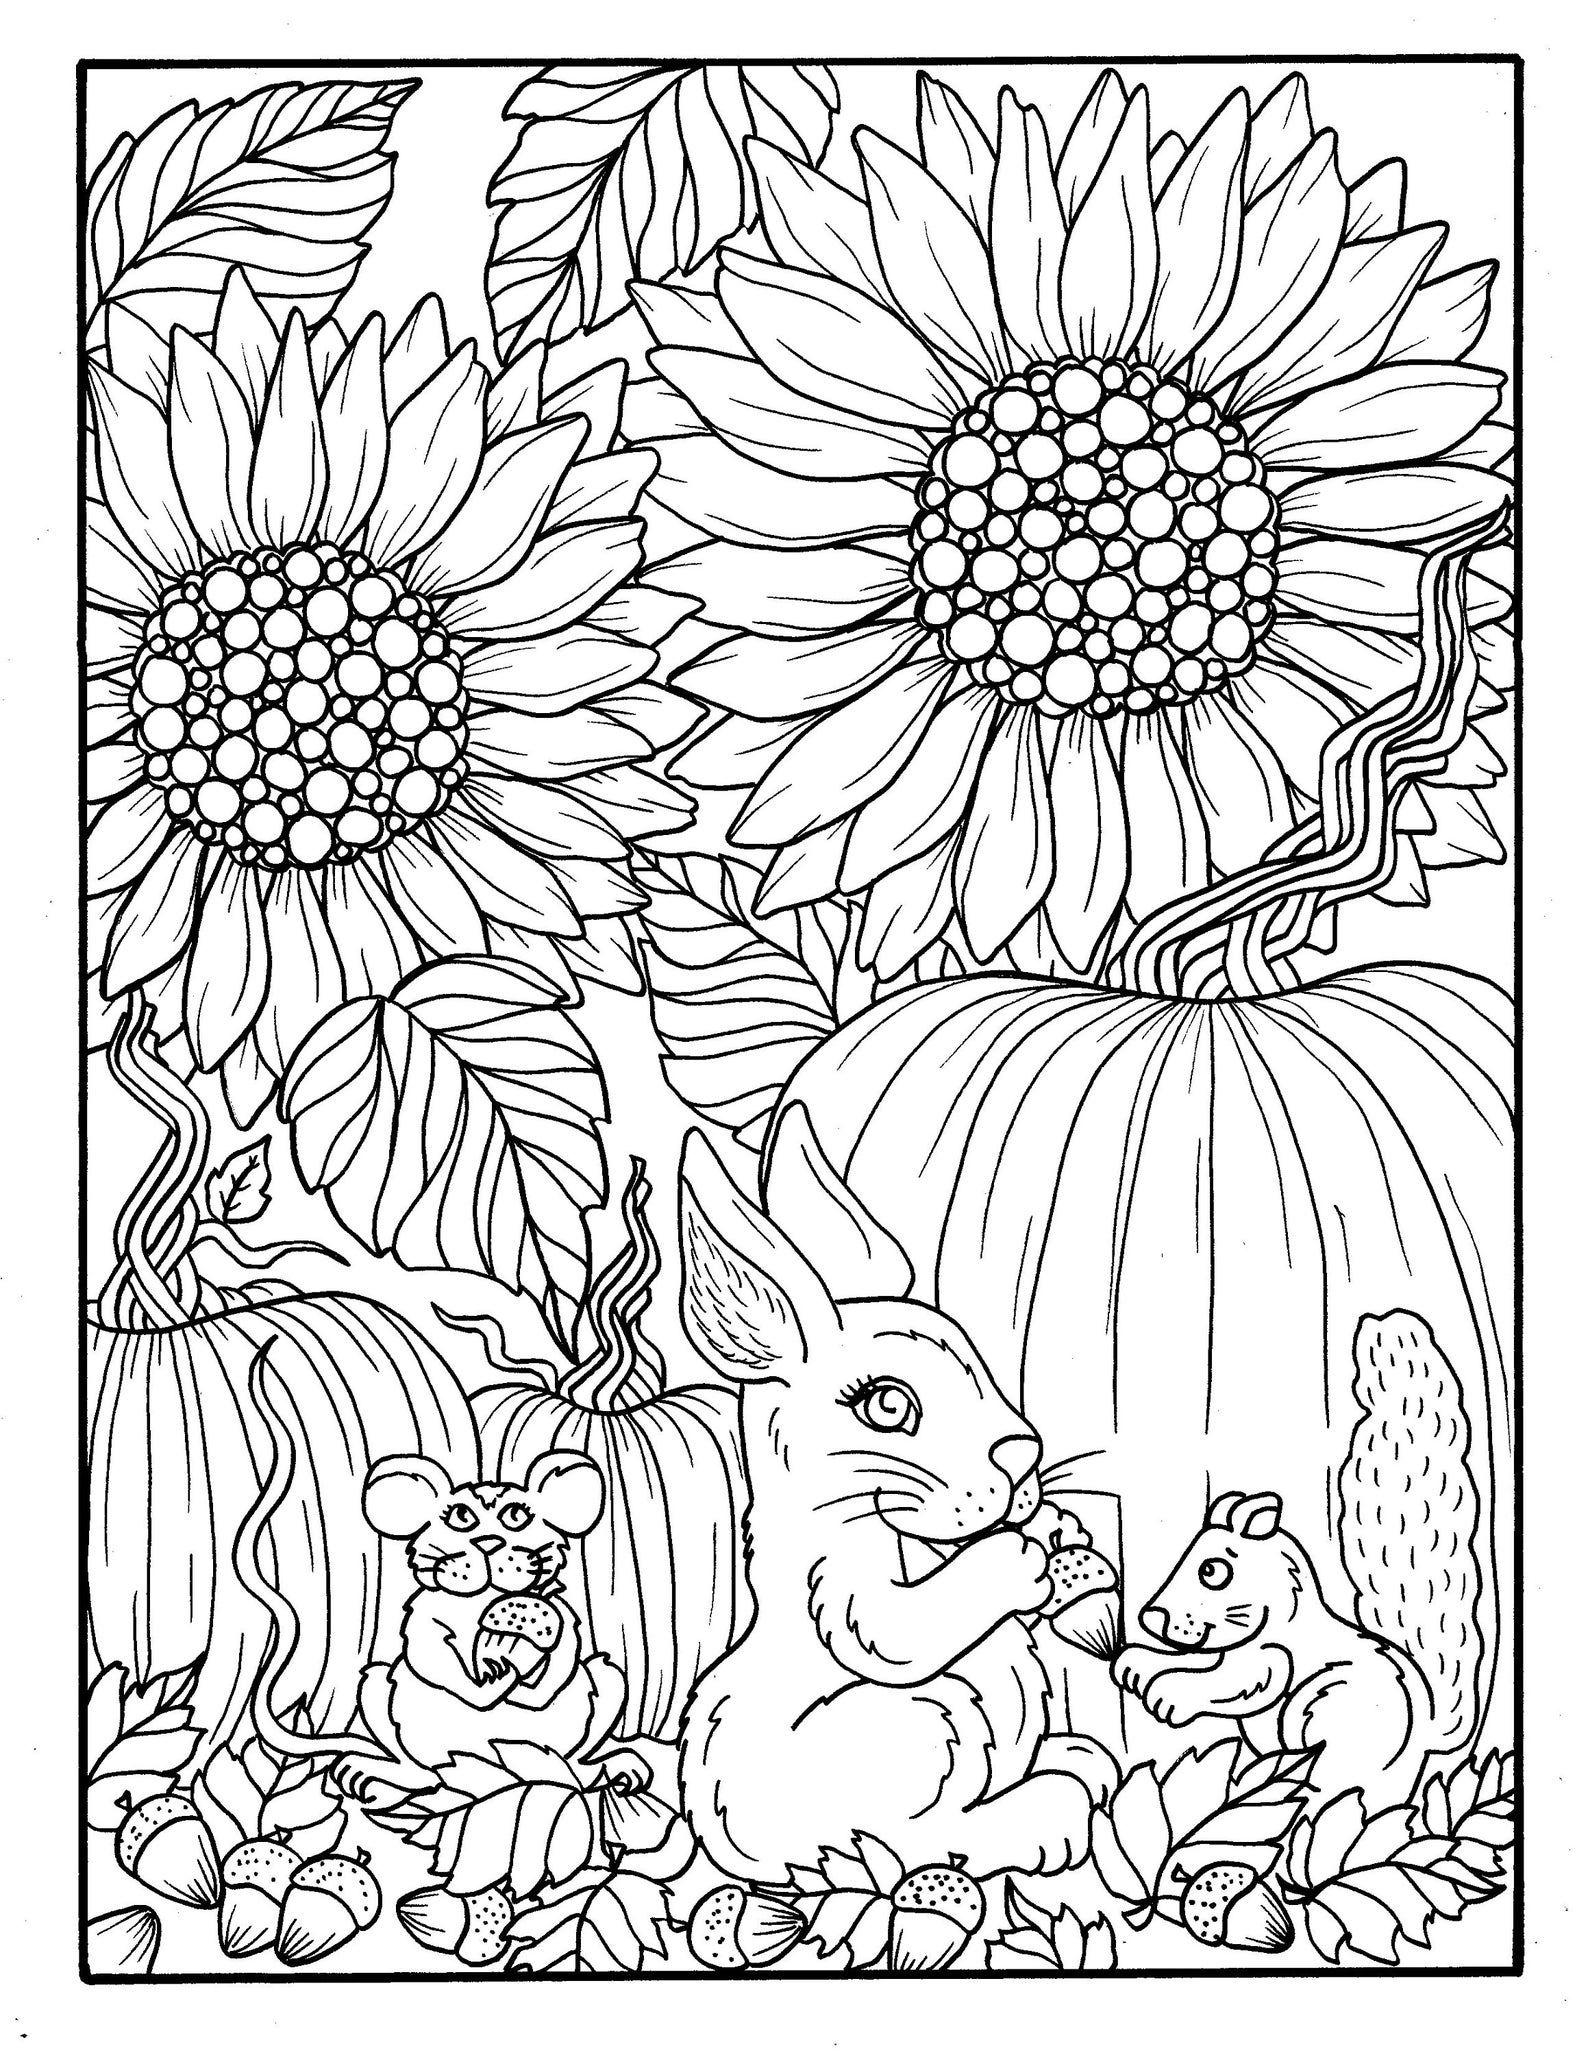 Fall Friends Digital Coloring Book Fall Pumpkins Cats Etsy Fall Coloring Pages Coloring Books Fall Coloring Sheets [ 2055 x 1588 Pixel ]